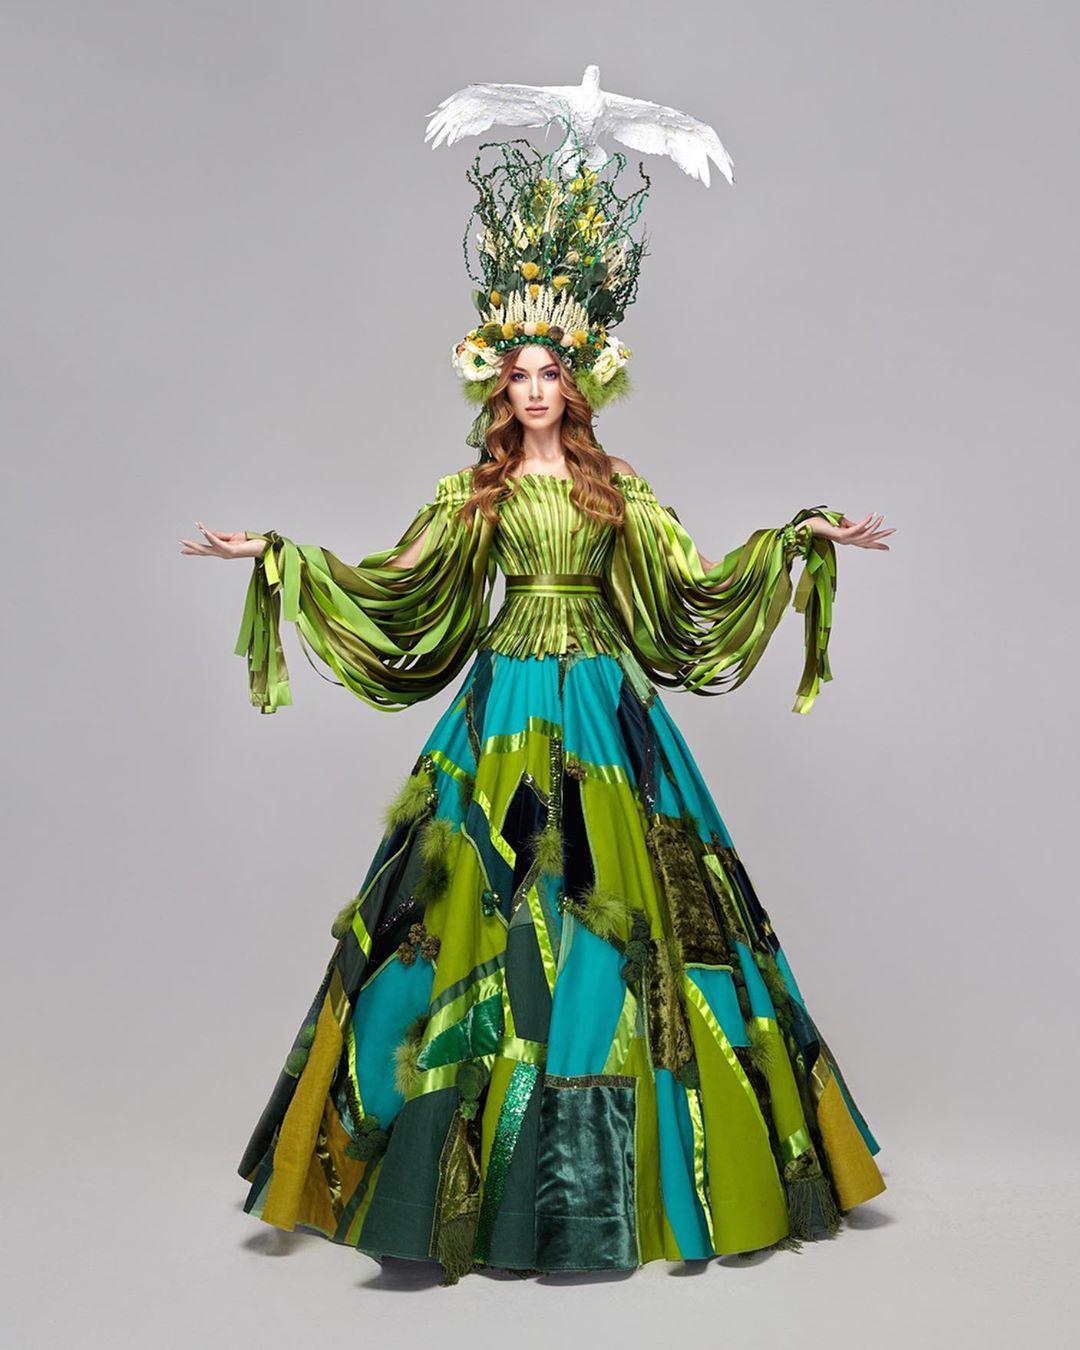 trajes tipicos de candidatas a miss universe 2019. IIqmZN